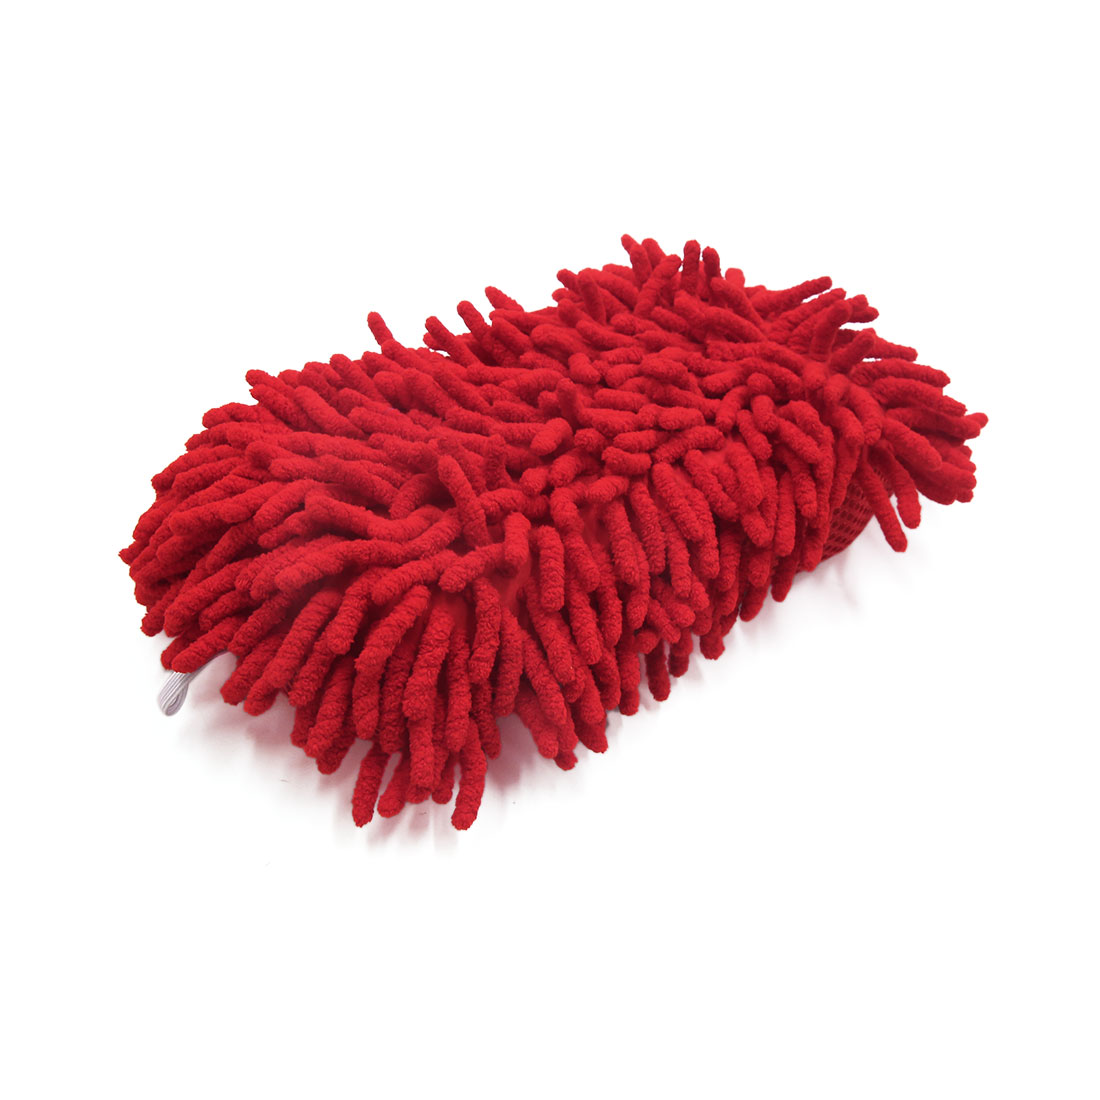 Red Microfiber Chenille 8 Shape Washing Brush Sponge Pad ...